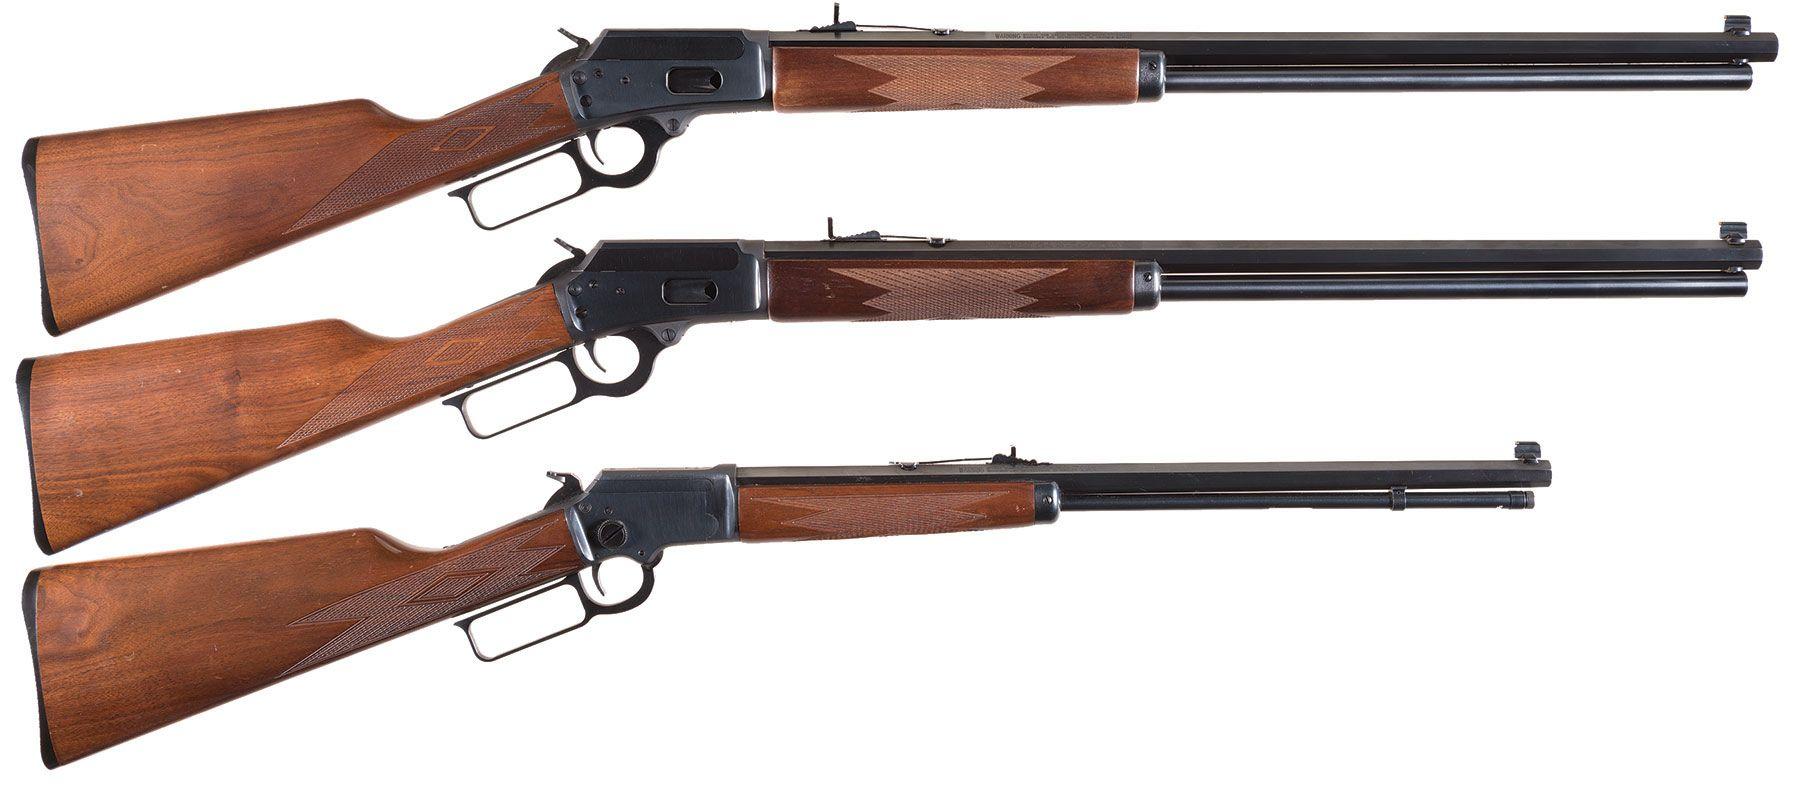 Three Marlin Lever Action Rifles -A) Marlin Model 1894 Cowboy Li